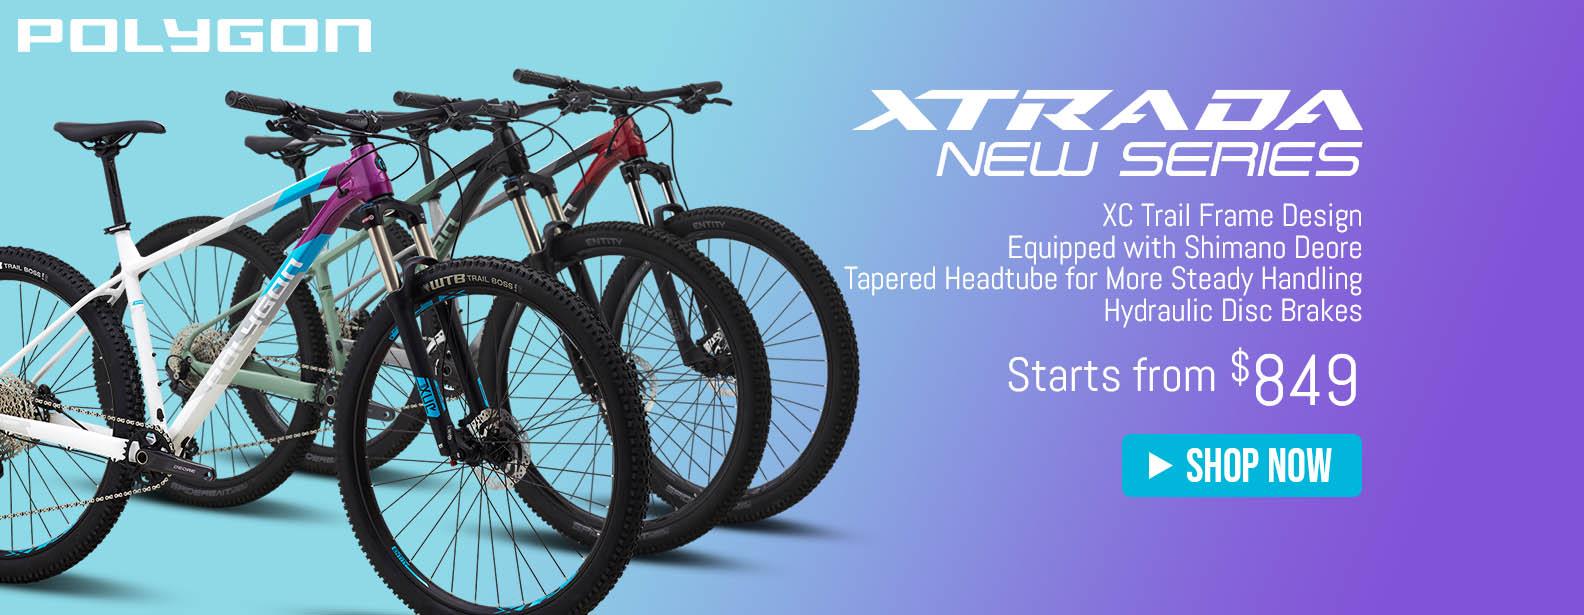 Polygon Xtrada Series Mountain Bike